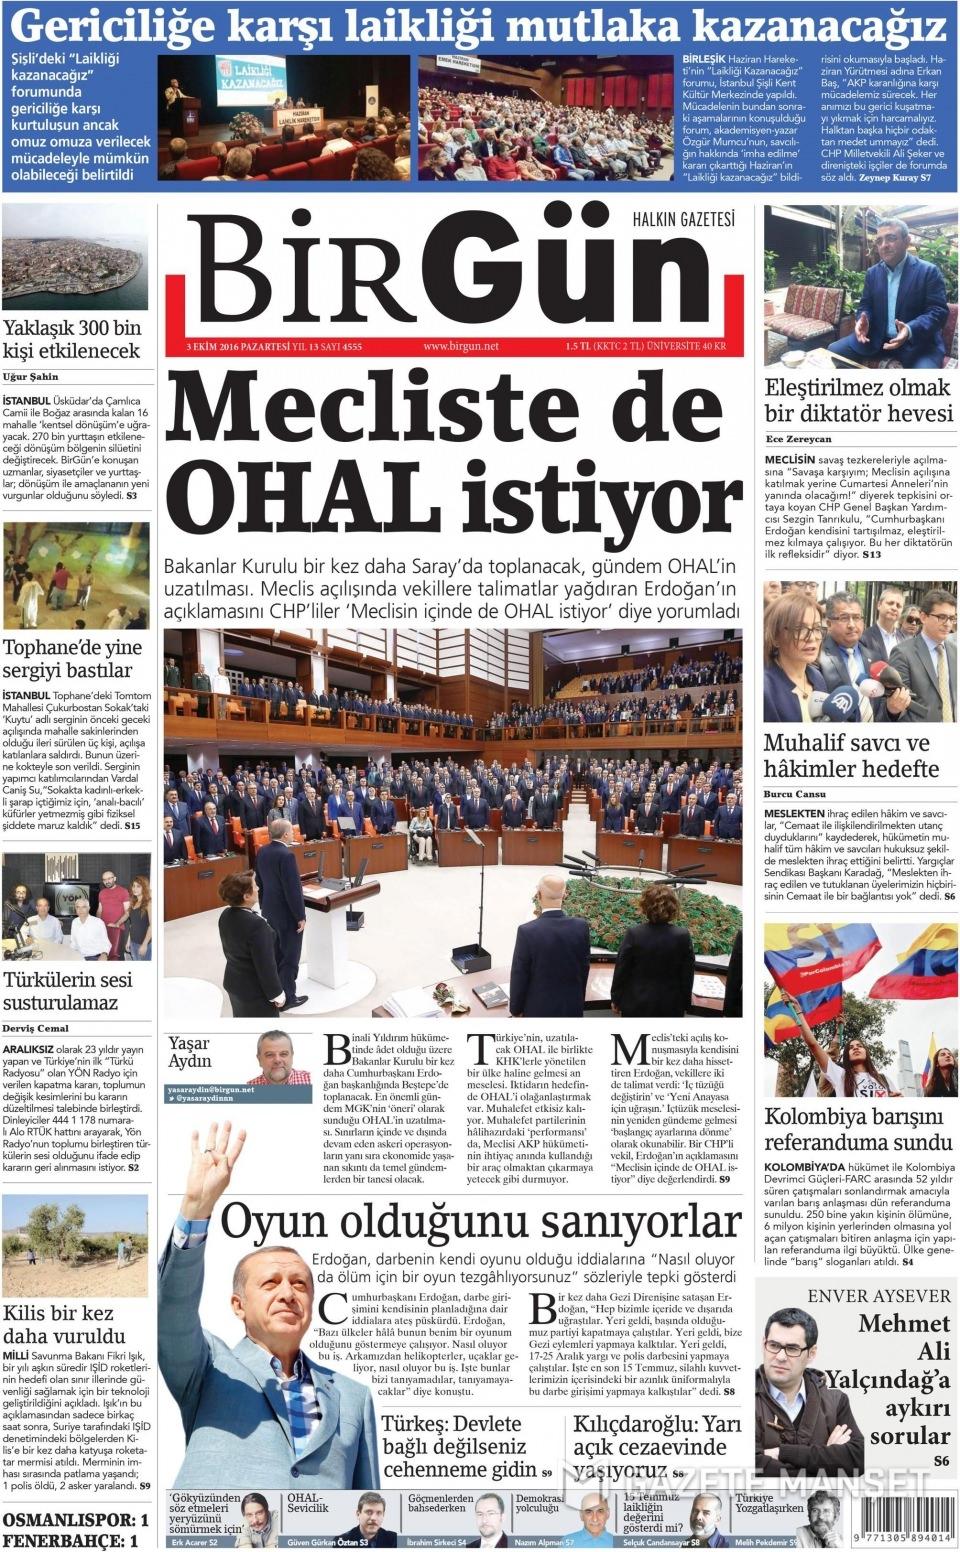 3 Ekim Pazartesi gazete manşetleri 17